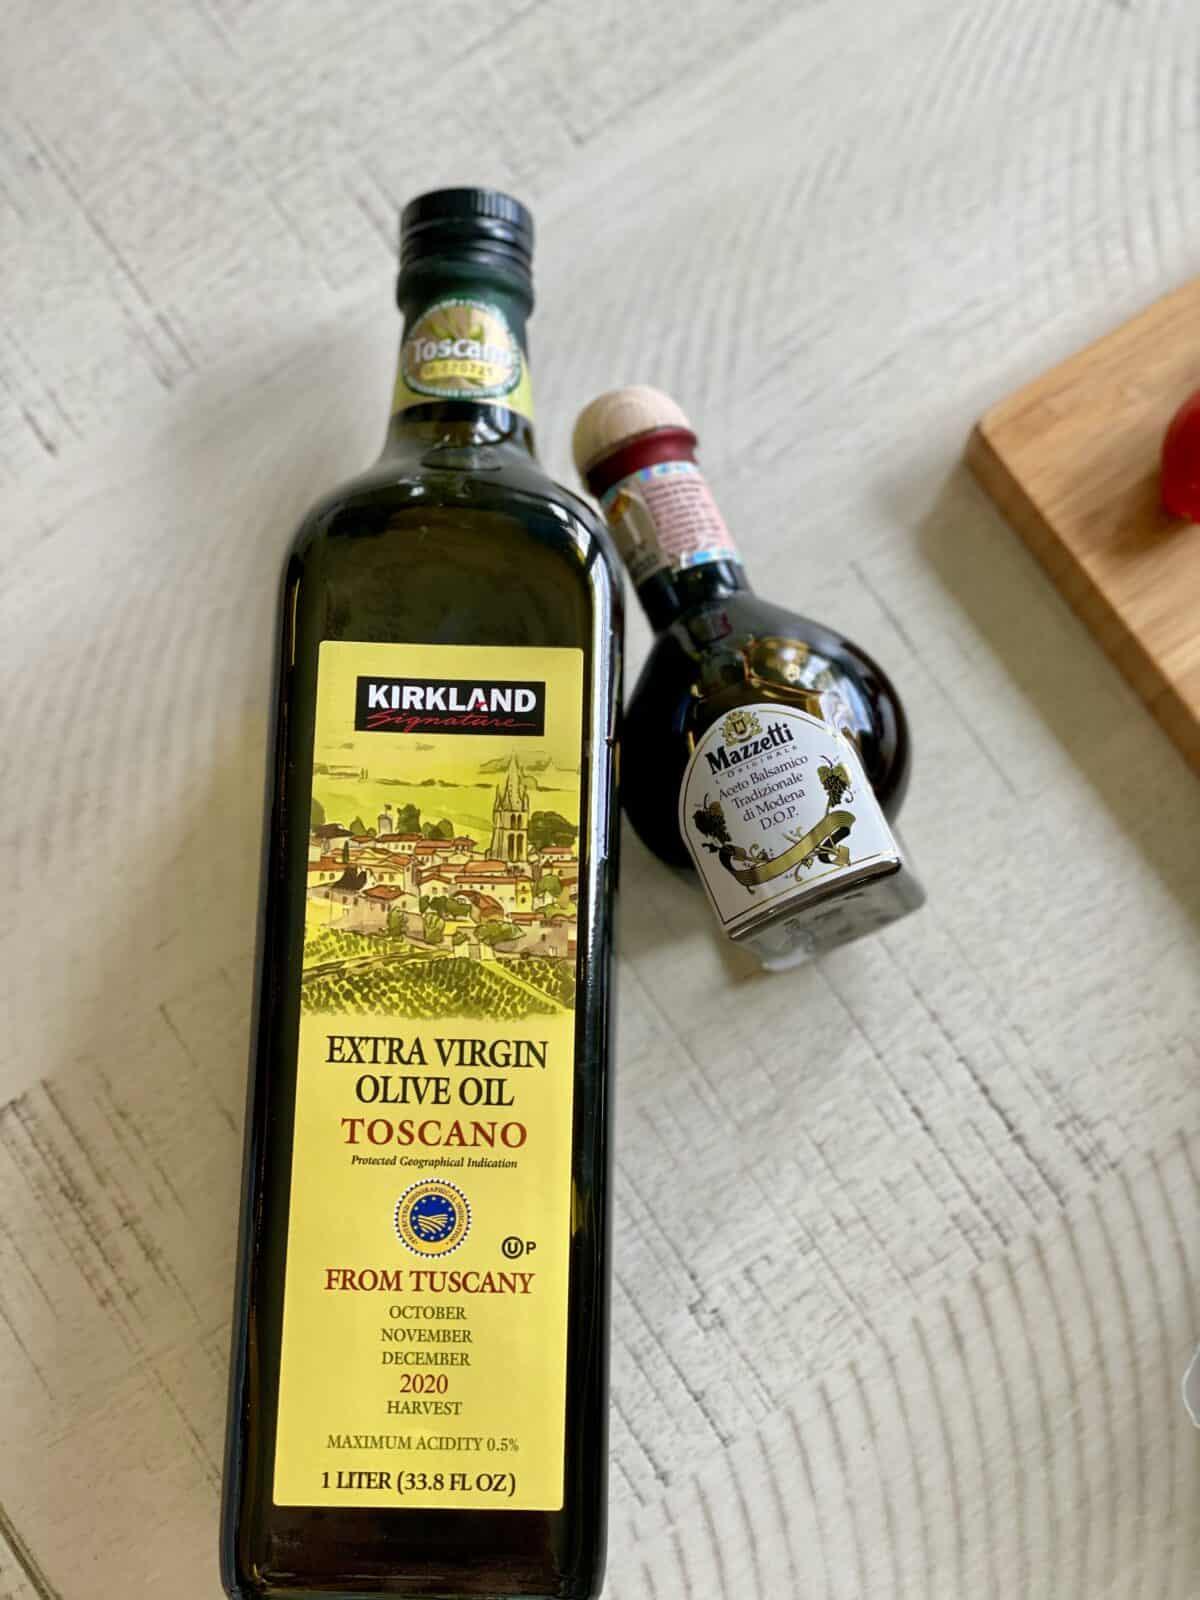 a bottle of kirkland signature extra virgin olive oil and a bottle of mazetti balsamic vinegar